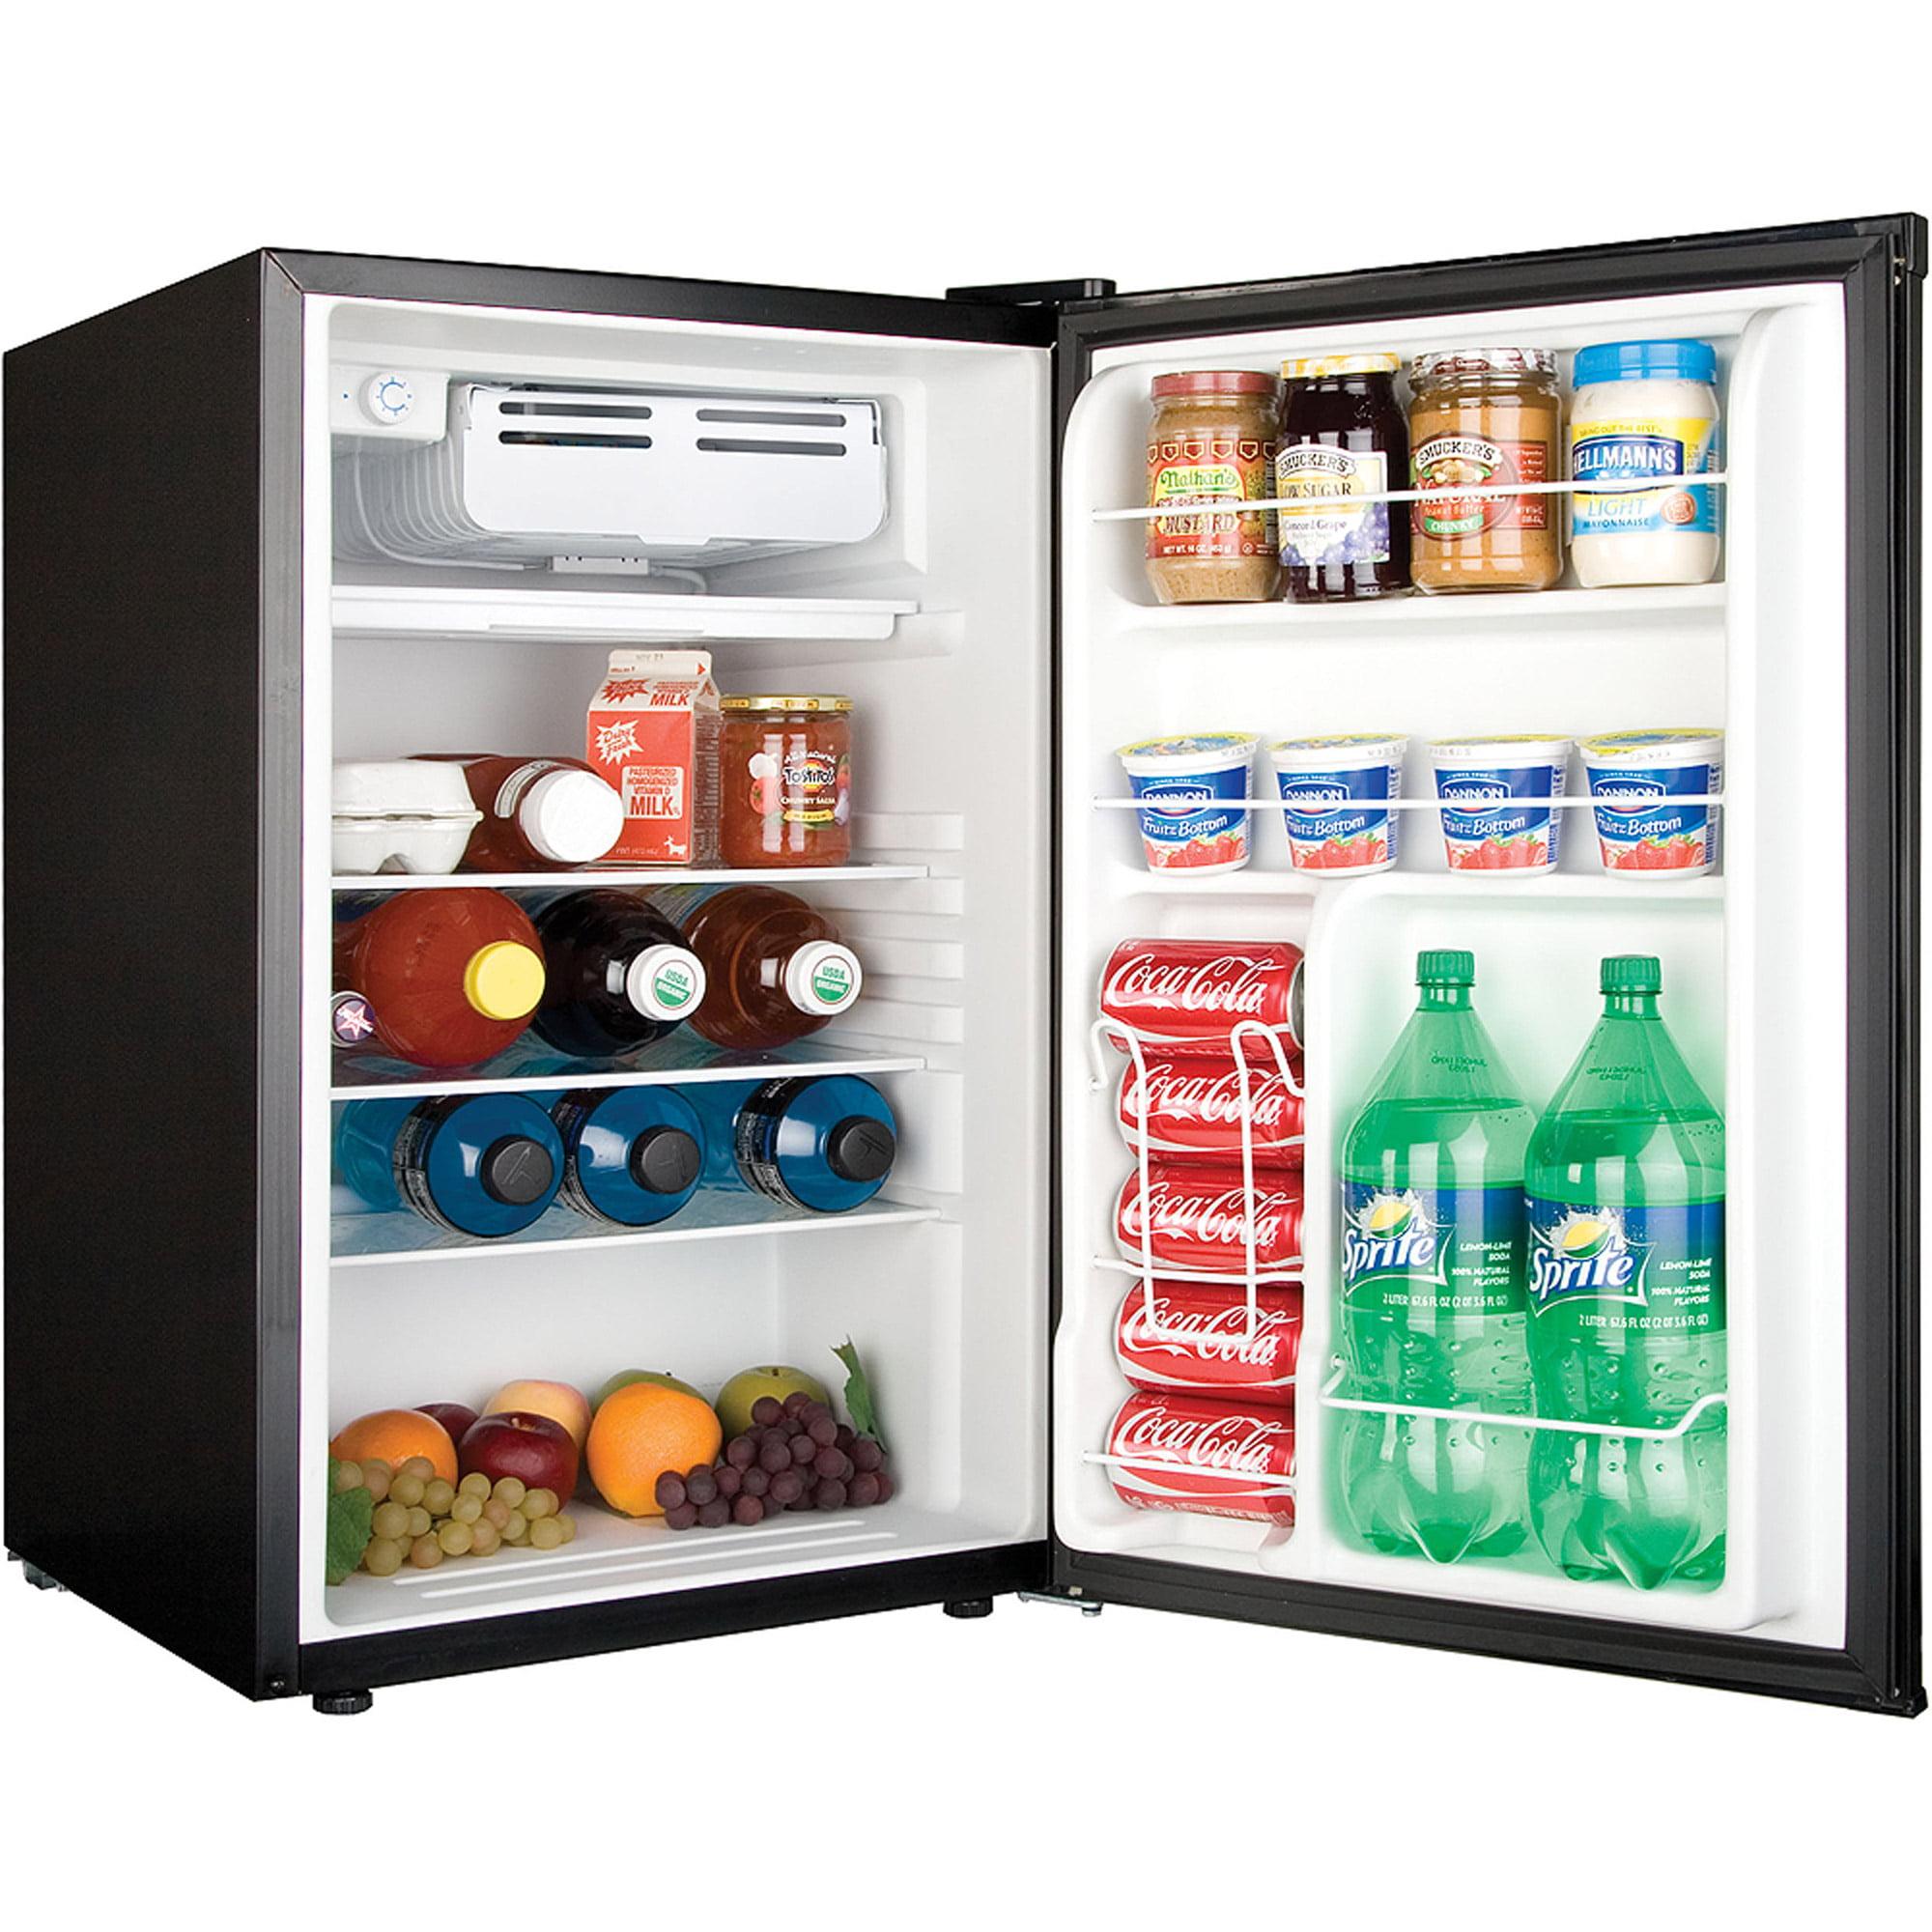 Long dress 18 refrigerator